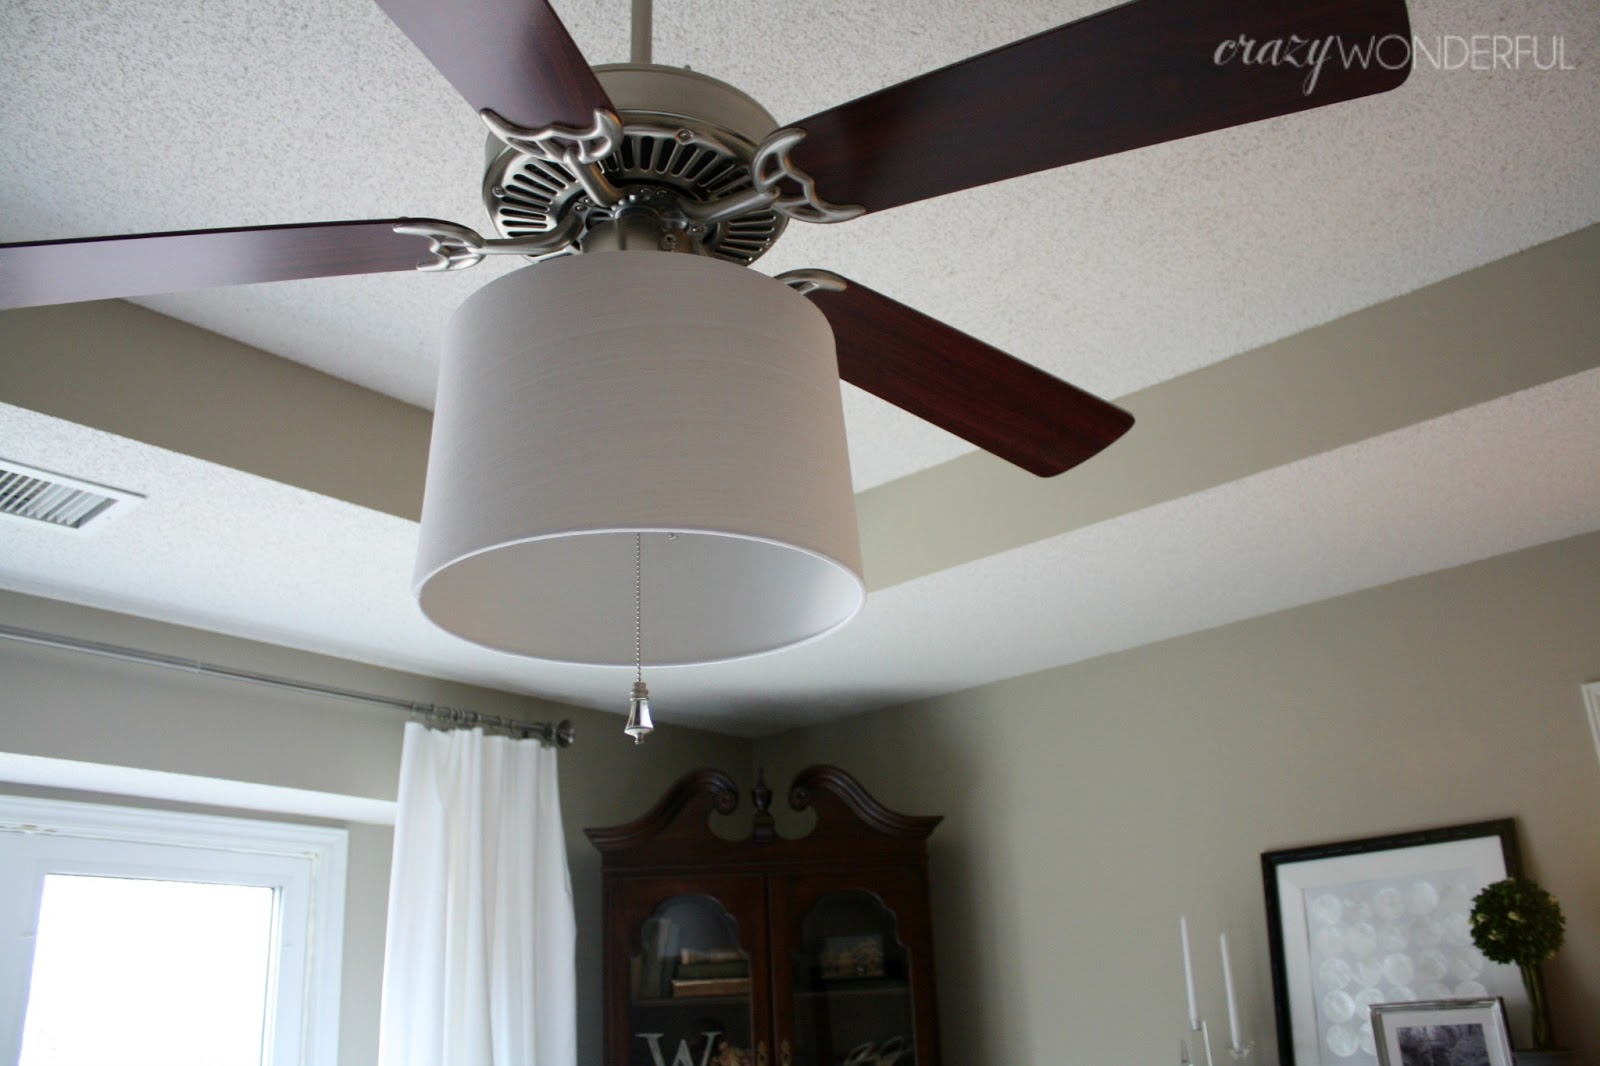 adding a drum shade to a ceiling fan - Crazy Wonderful